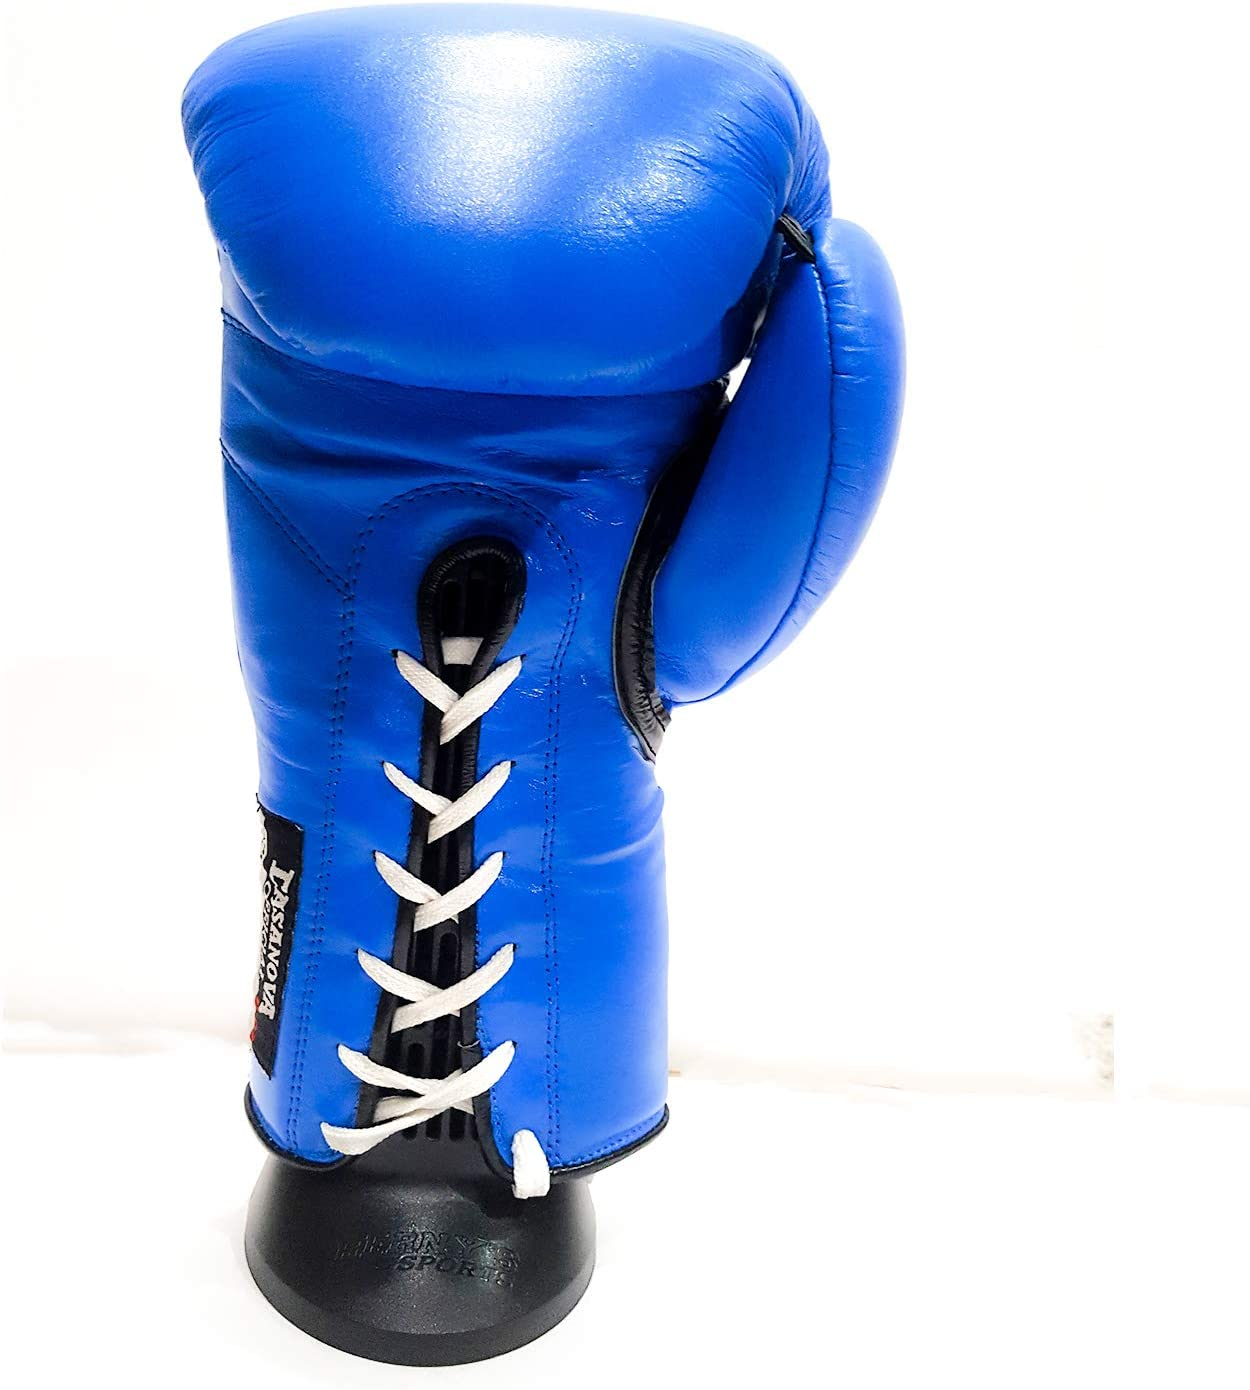 Blue, 16 oz Casanova Professional LACE-UP Boxing Gloves